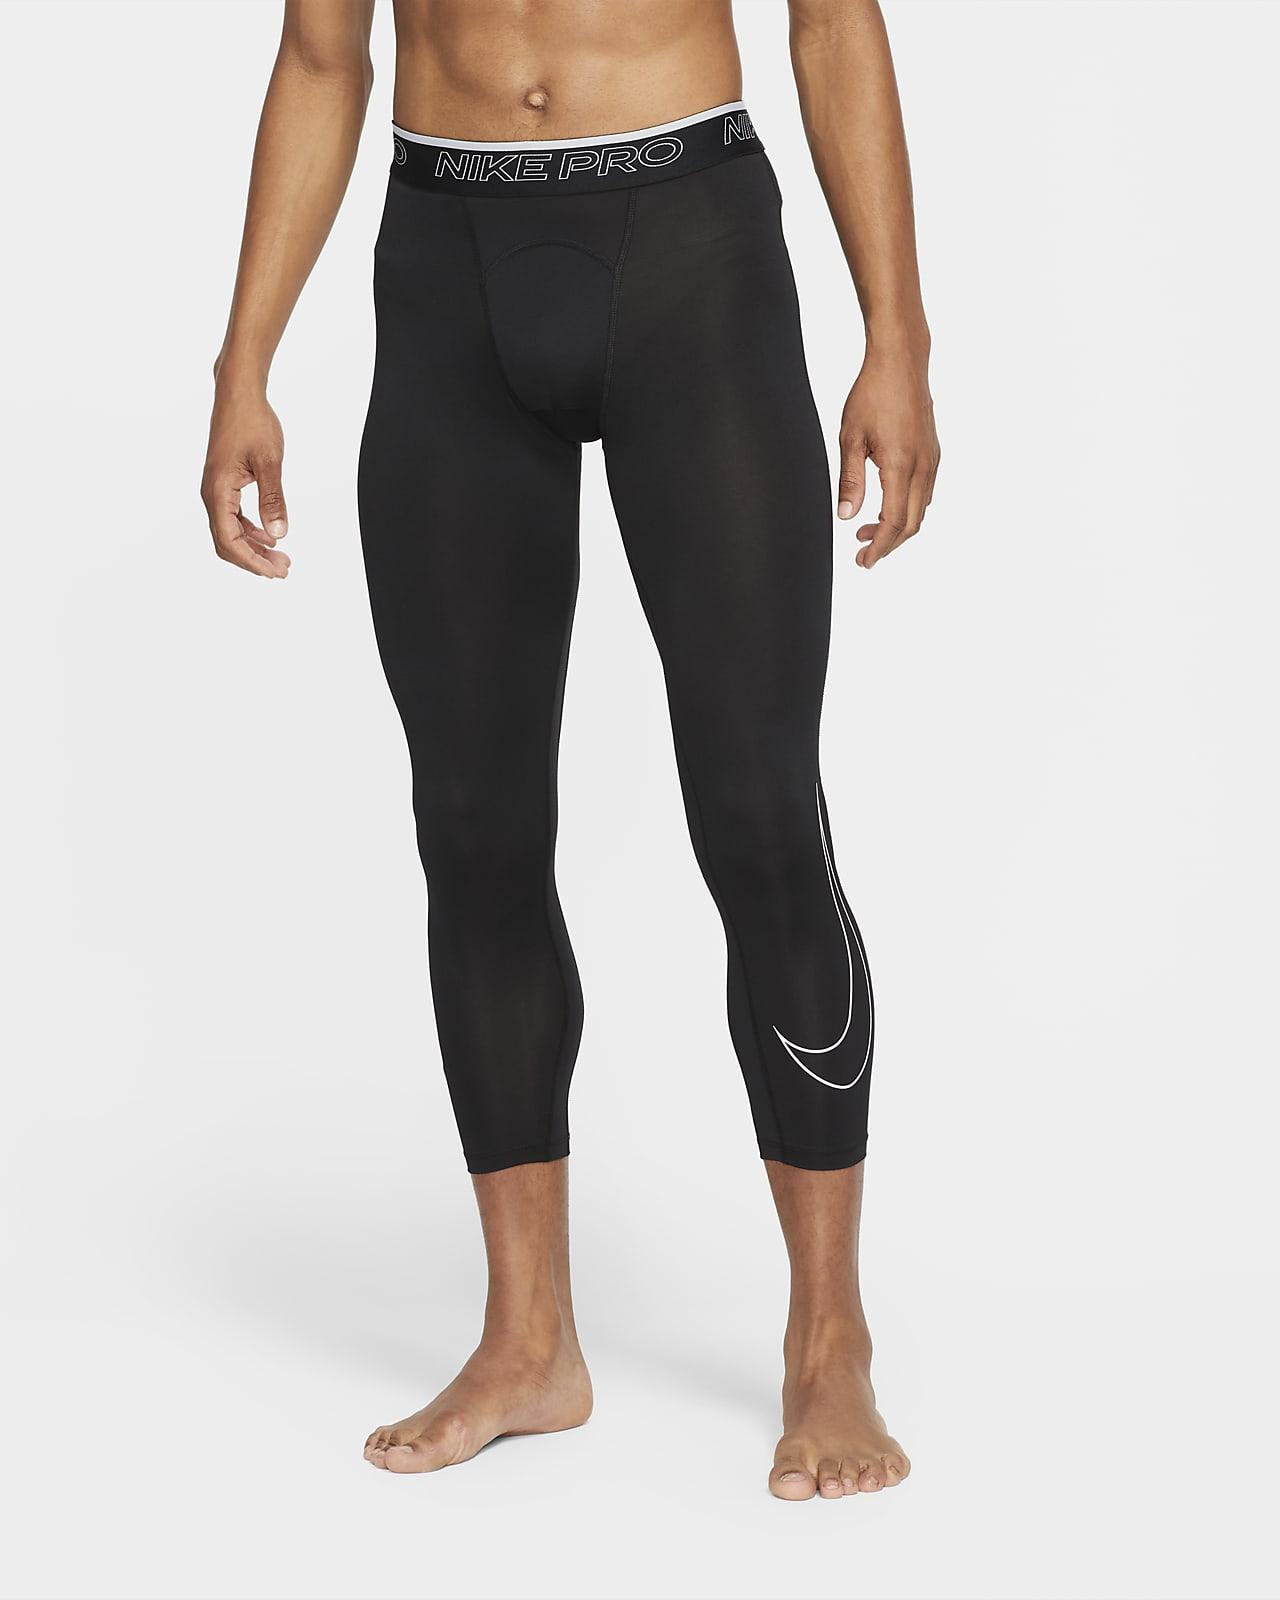 Mallas de 3/4 para hombre Nike Pro Dri-FIT